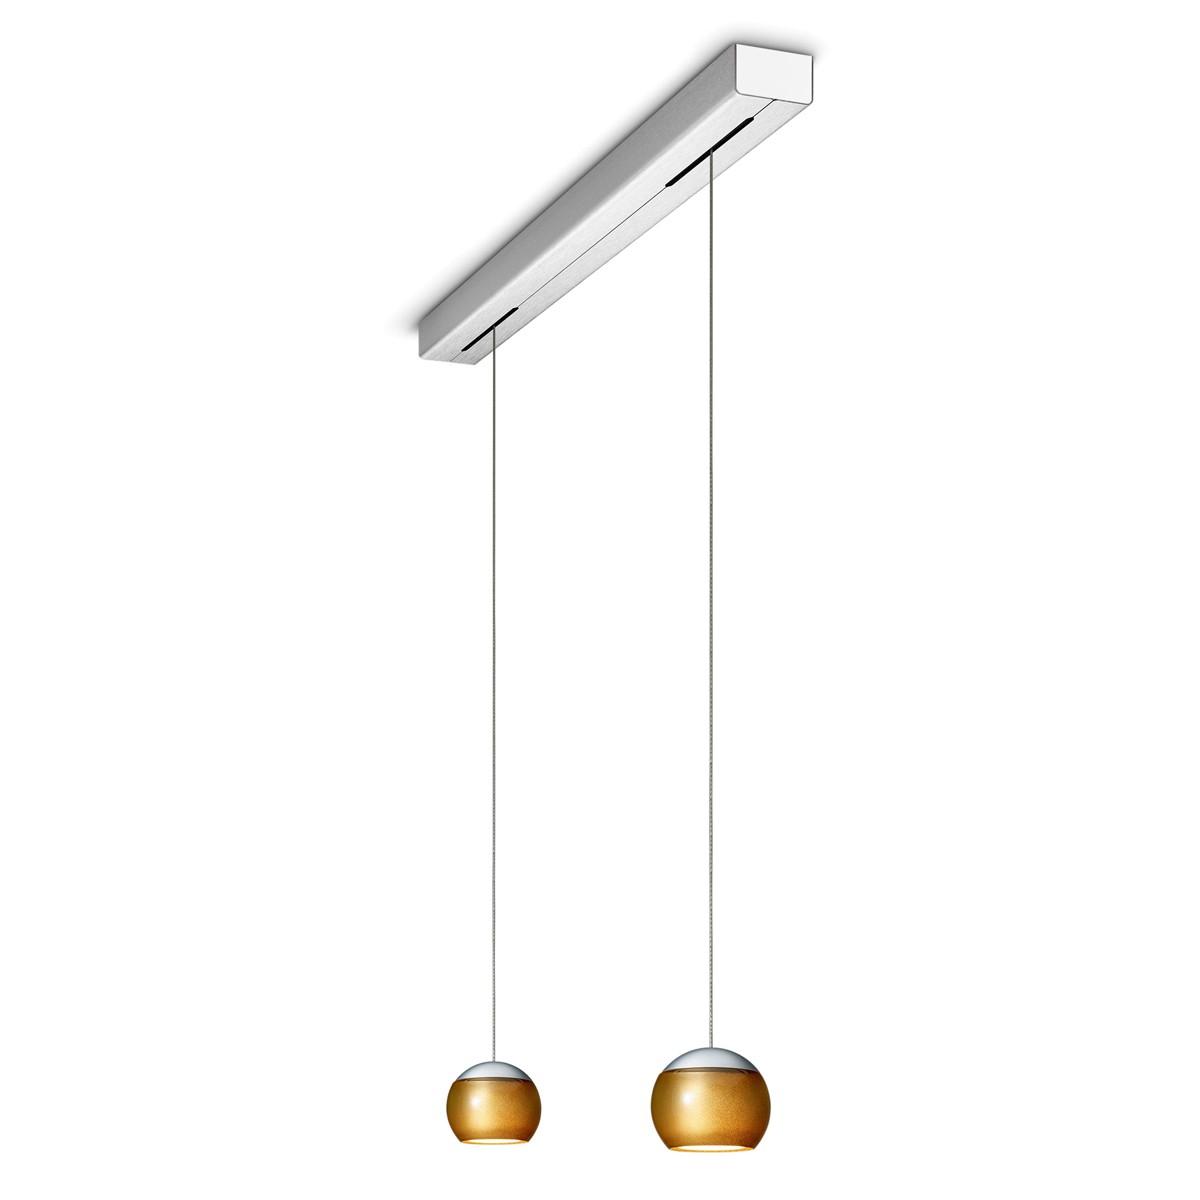 Oligo Balino LED Pendelleuchte, 2-flg., 1. Generation, Chrom matt / Gold glänzend